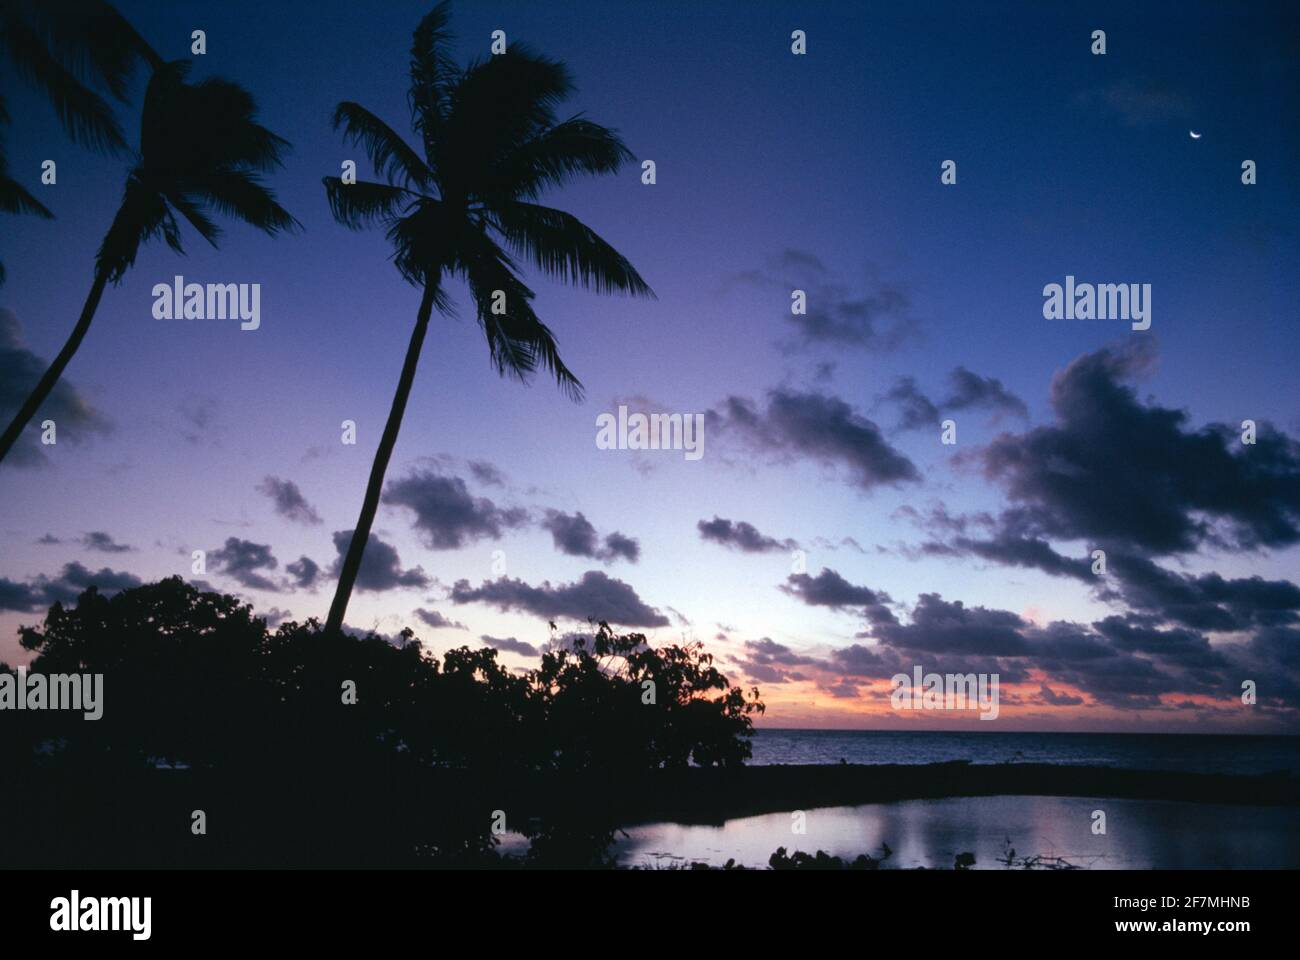 Polinesia Francesa. Islas Tuamotu. Costa de Rangiroa. Palmeras de coco al atardecer. Foto de stock